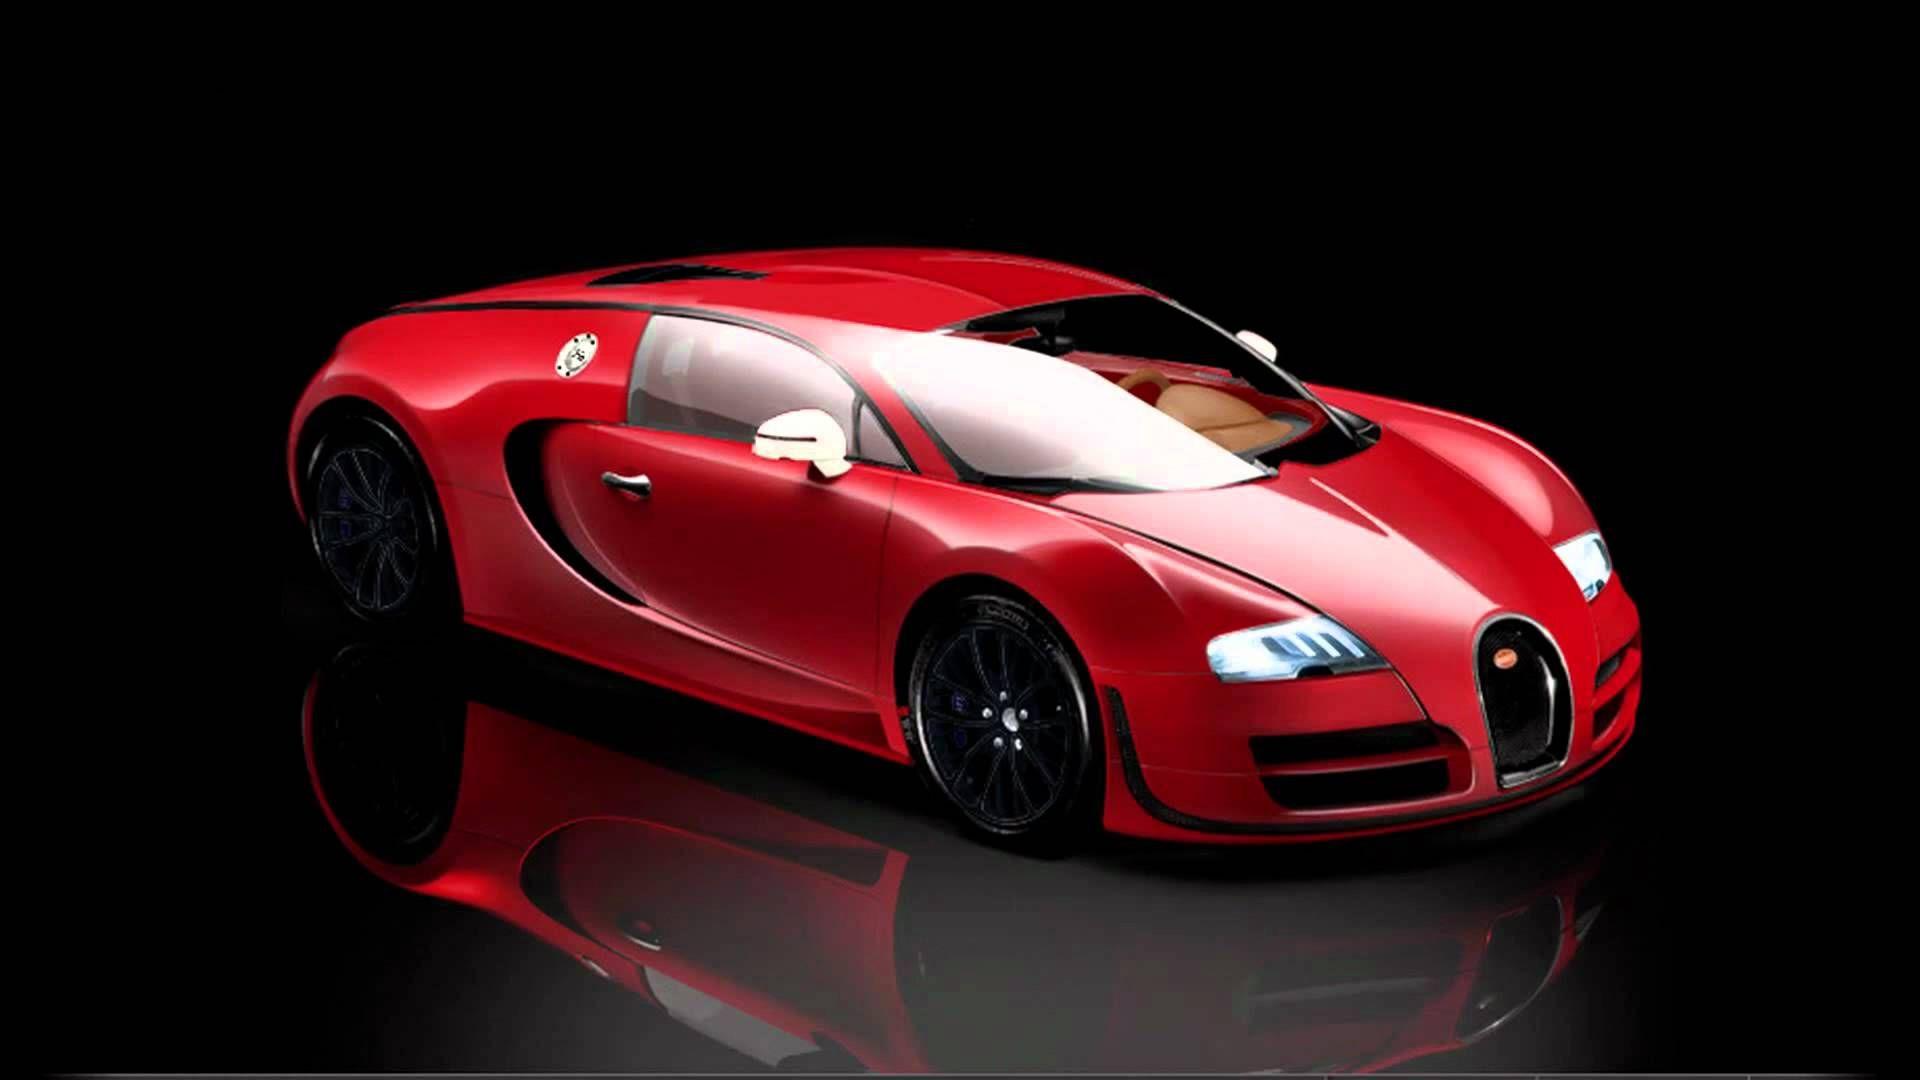 Red Bugatti Veyron Supersport Bugatti Veyron Super Sport Bugatti Super Sport Veyron